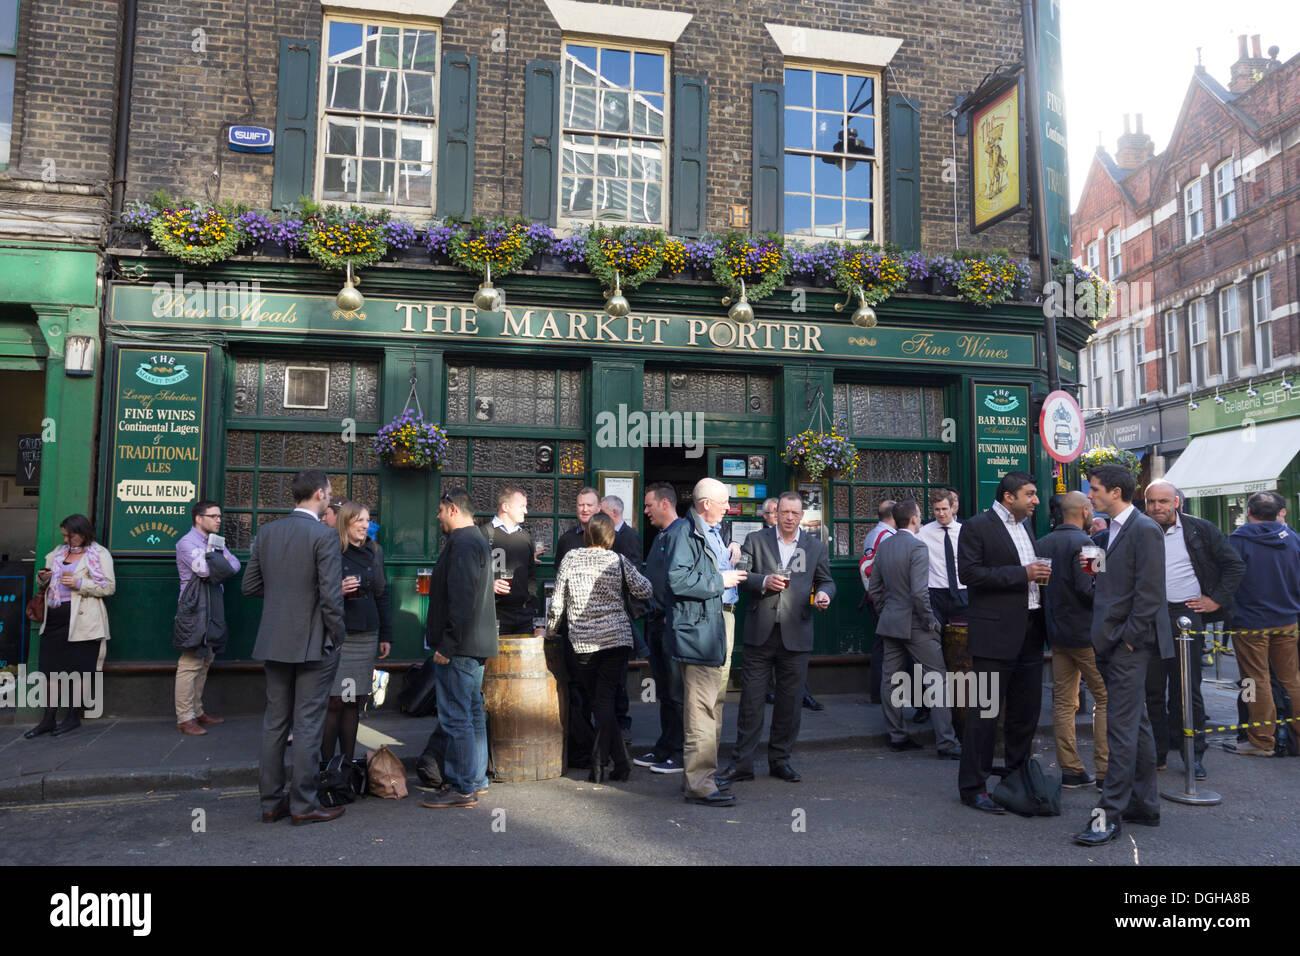 The Market Porter Pub - Borough Market - Southwark - London - Stock Image